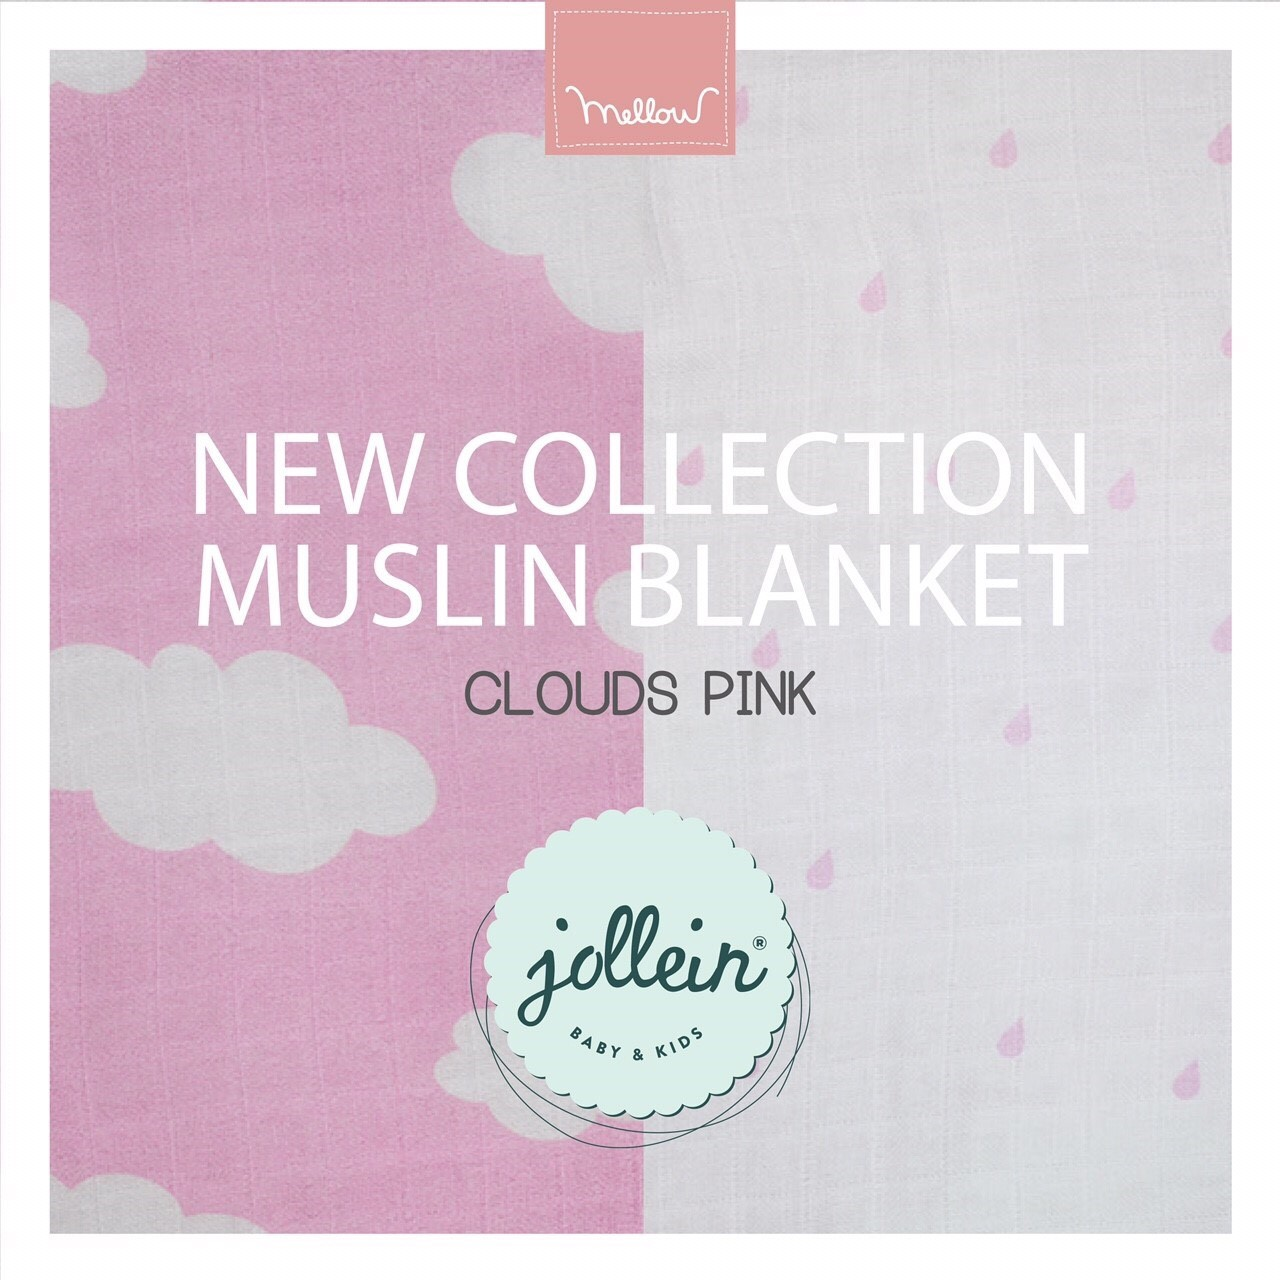 Jollein - Muslin blanket Cloud pink ผ้าห่มมัสลิน ทอ 8 ชั้้น ลายก้อนเมฆชมพู